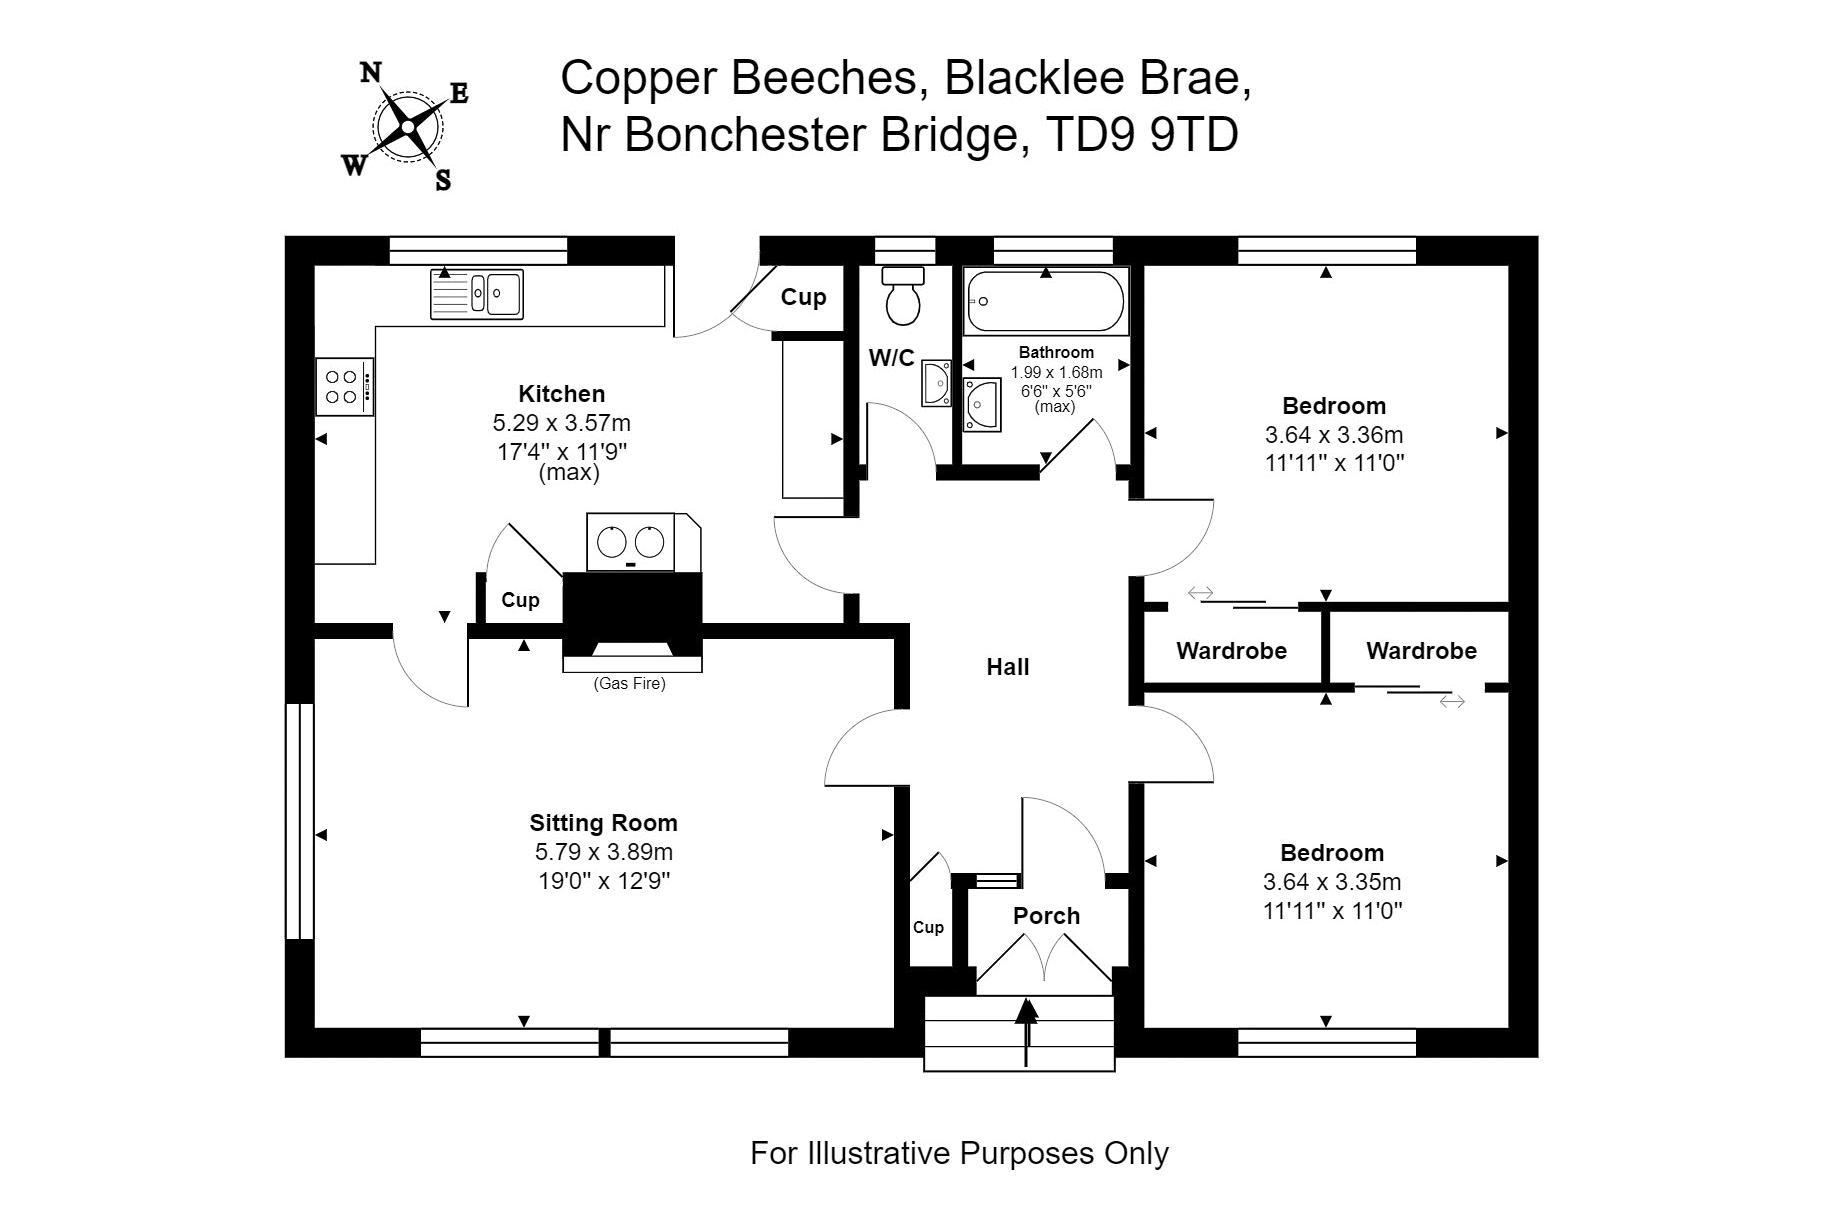 Copper Beeches